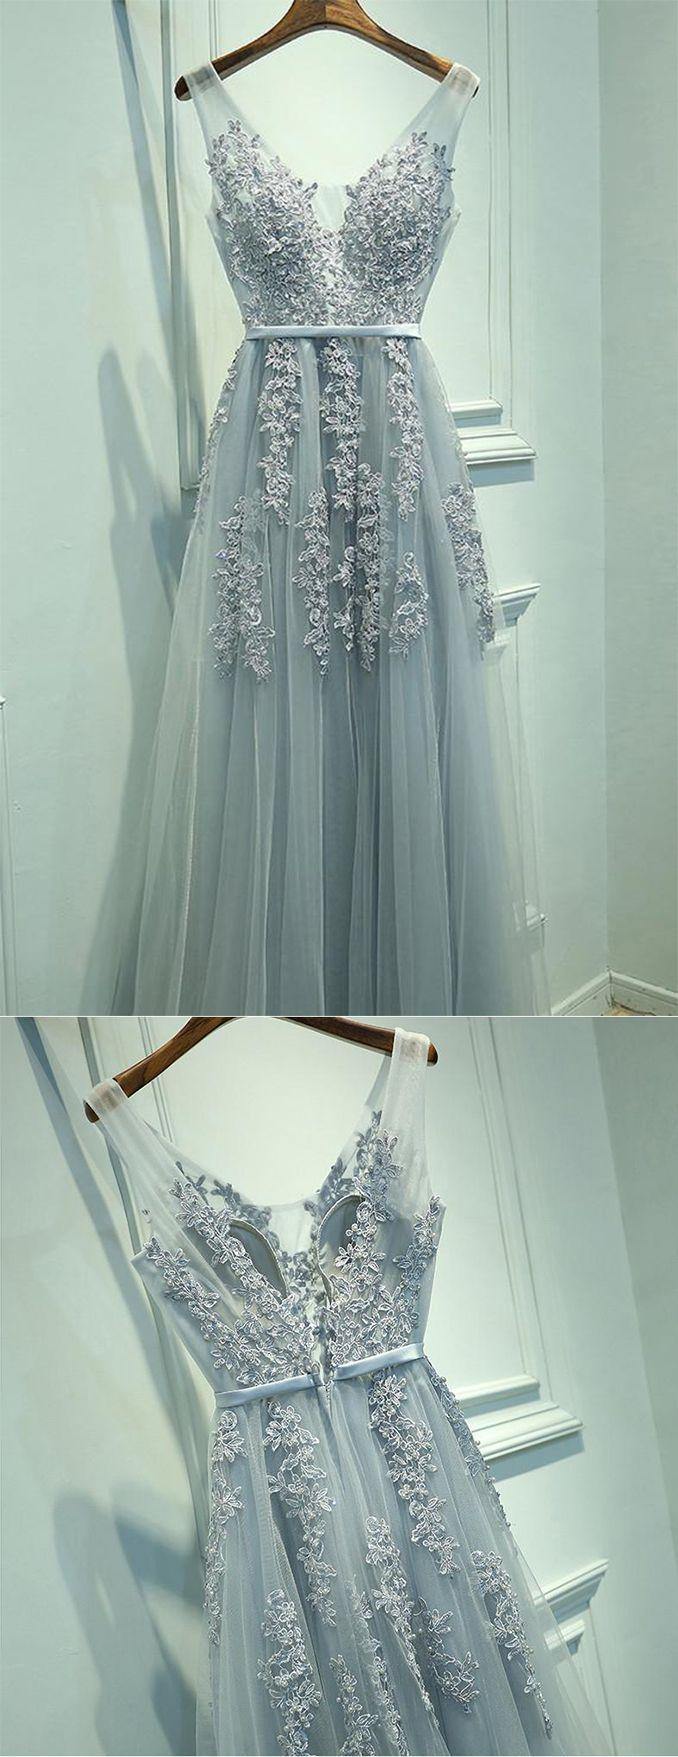 Gray Chiffon Long V-neck Evening Dresses, A Line Applique Prom Dress #gray #long #prom #tulle #evening #OKDRESSES